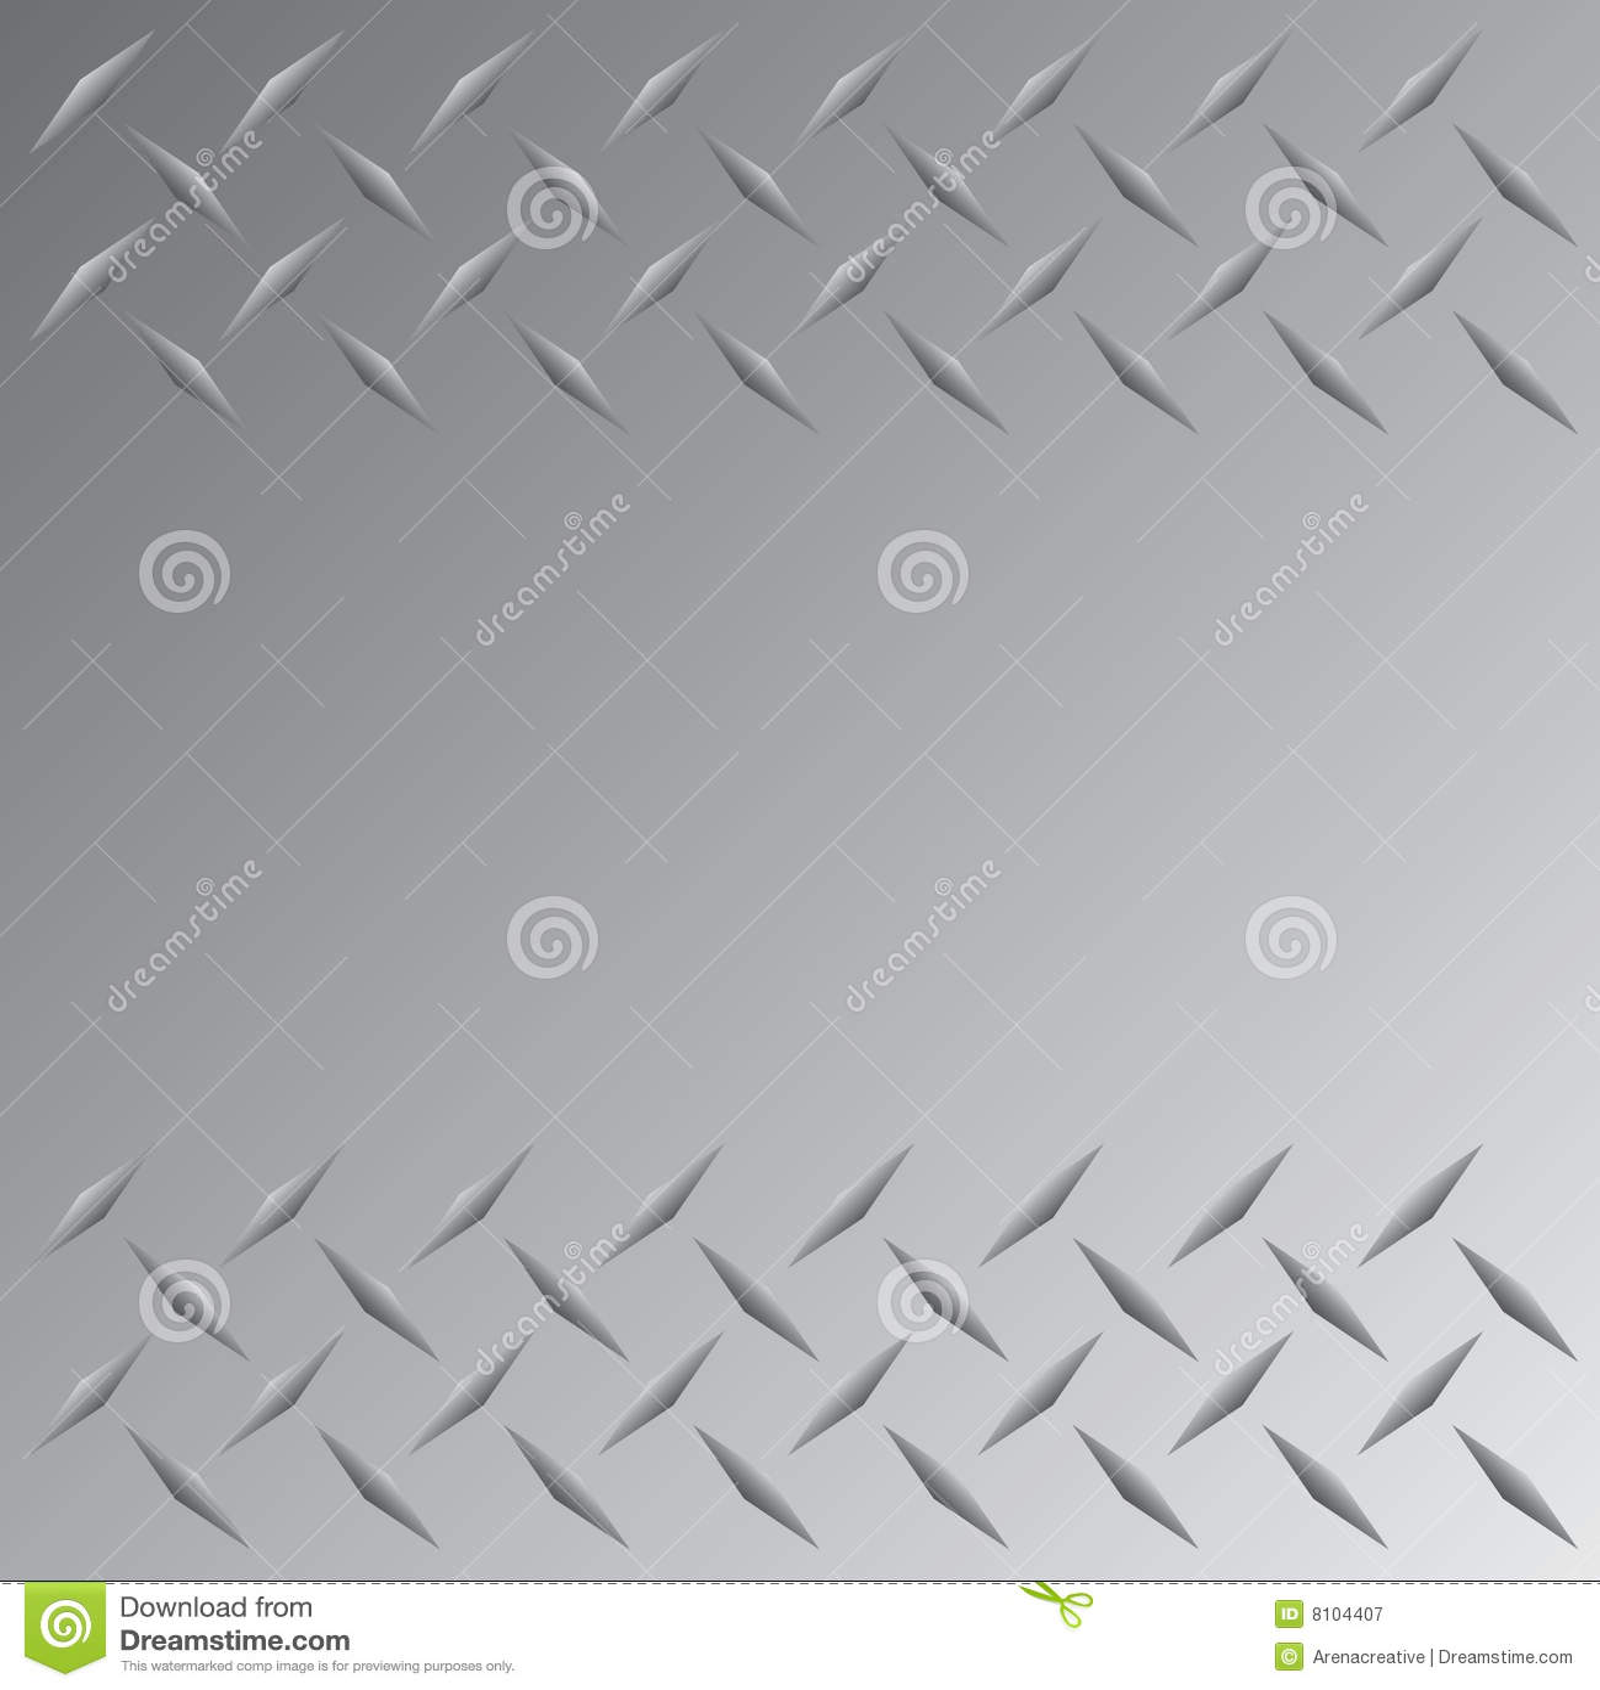 diamond plate metallic border - photo #17